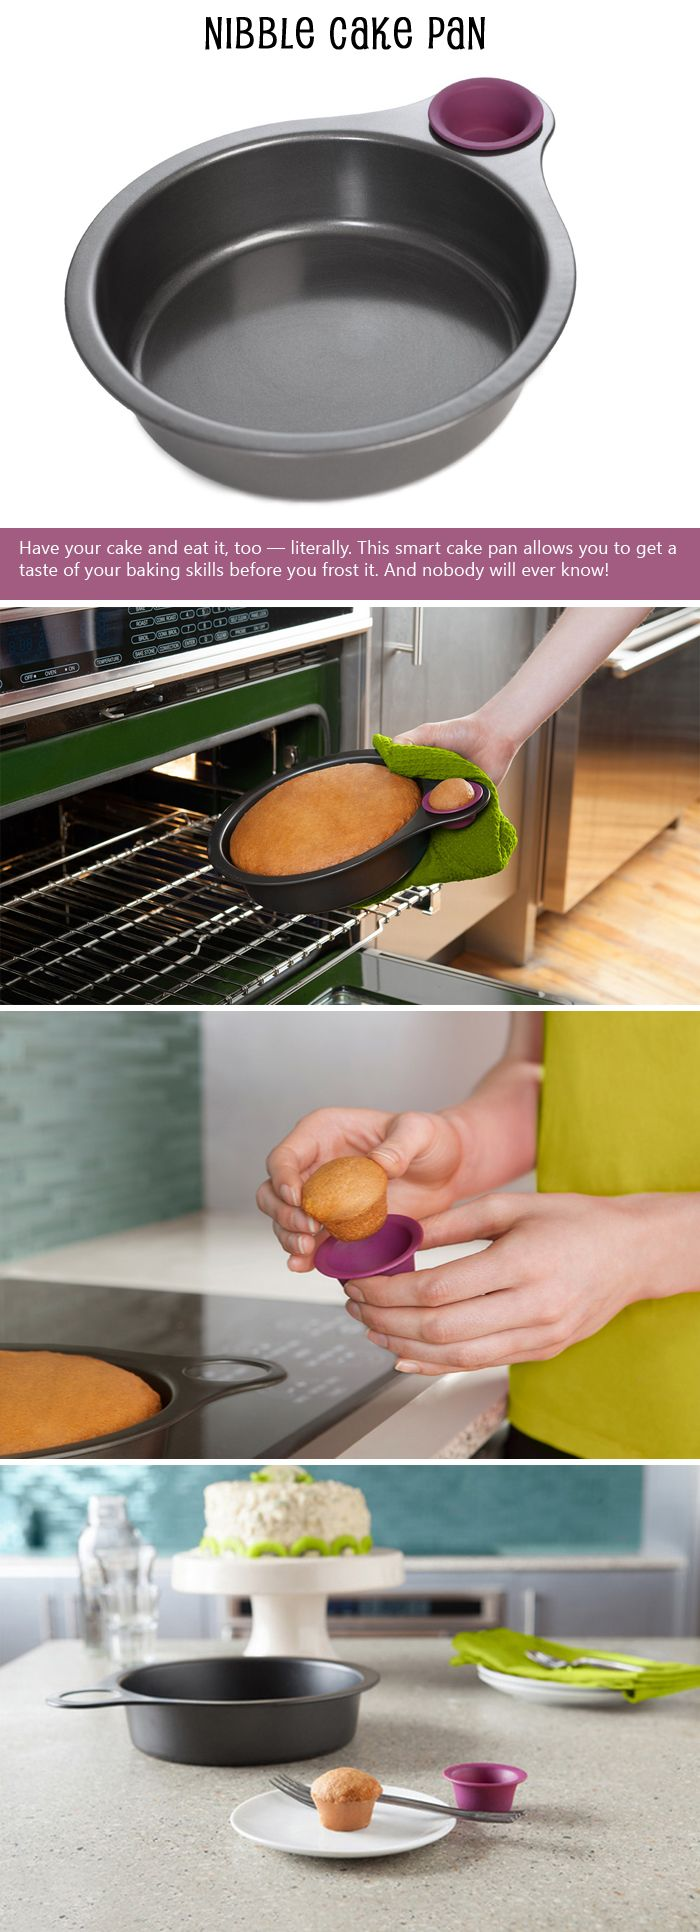 1000+ ideas about Baking Gadgets on Pinterest Baking ...